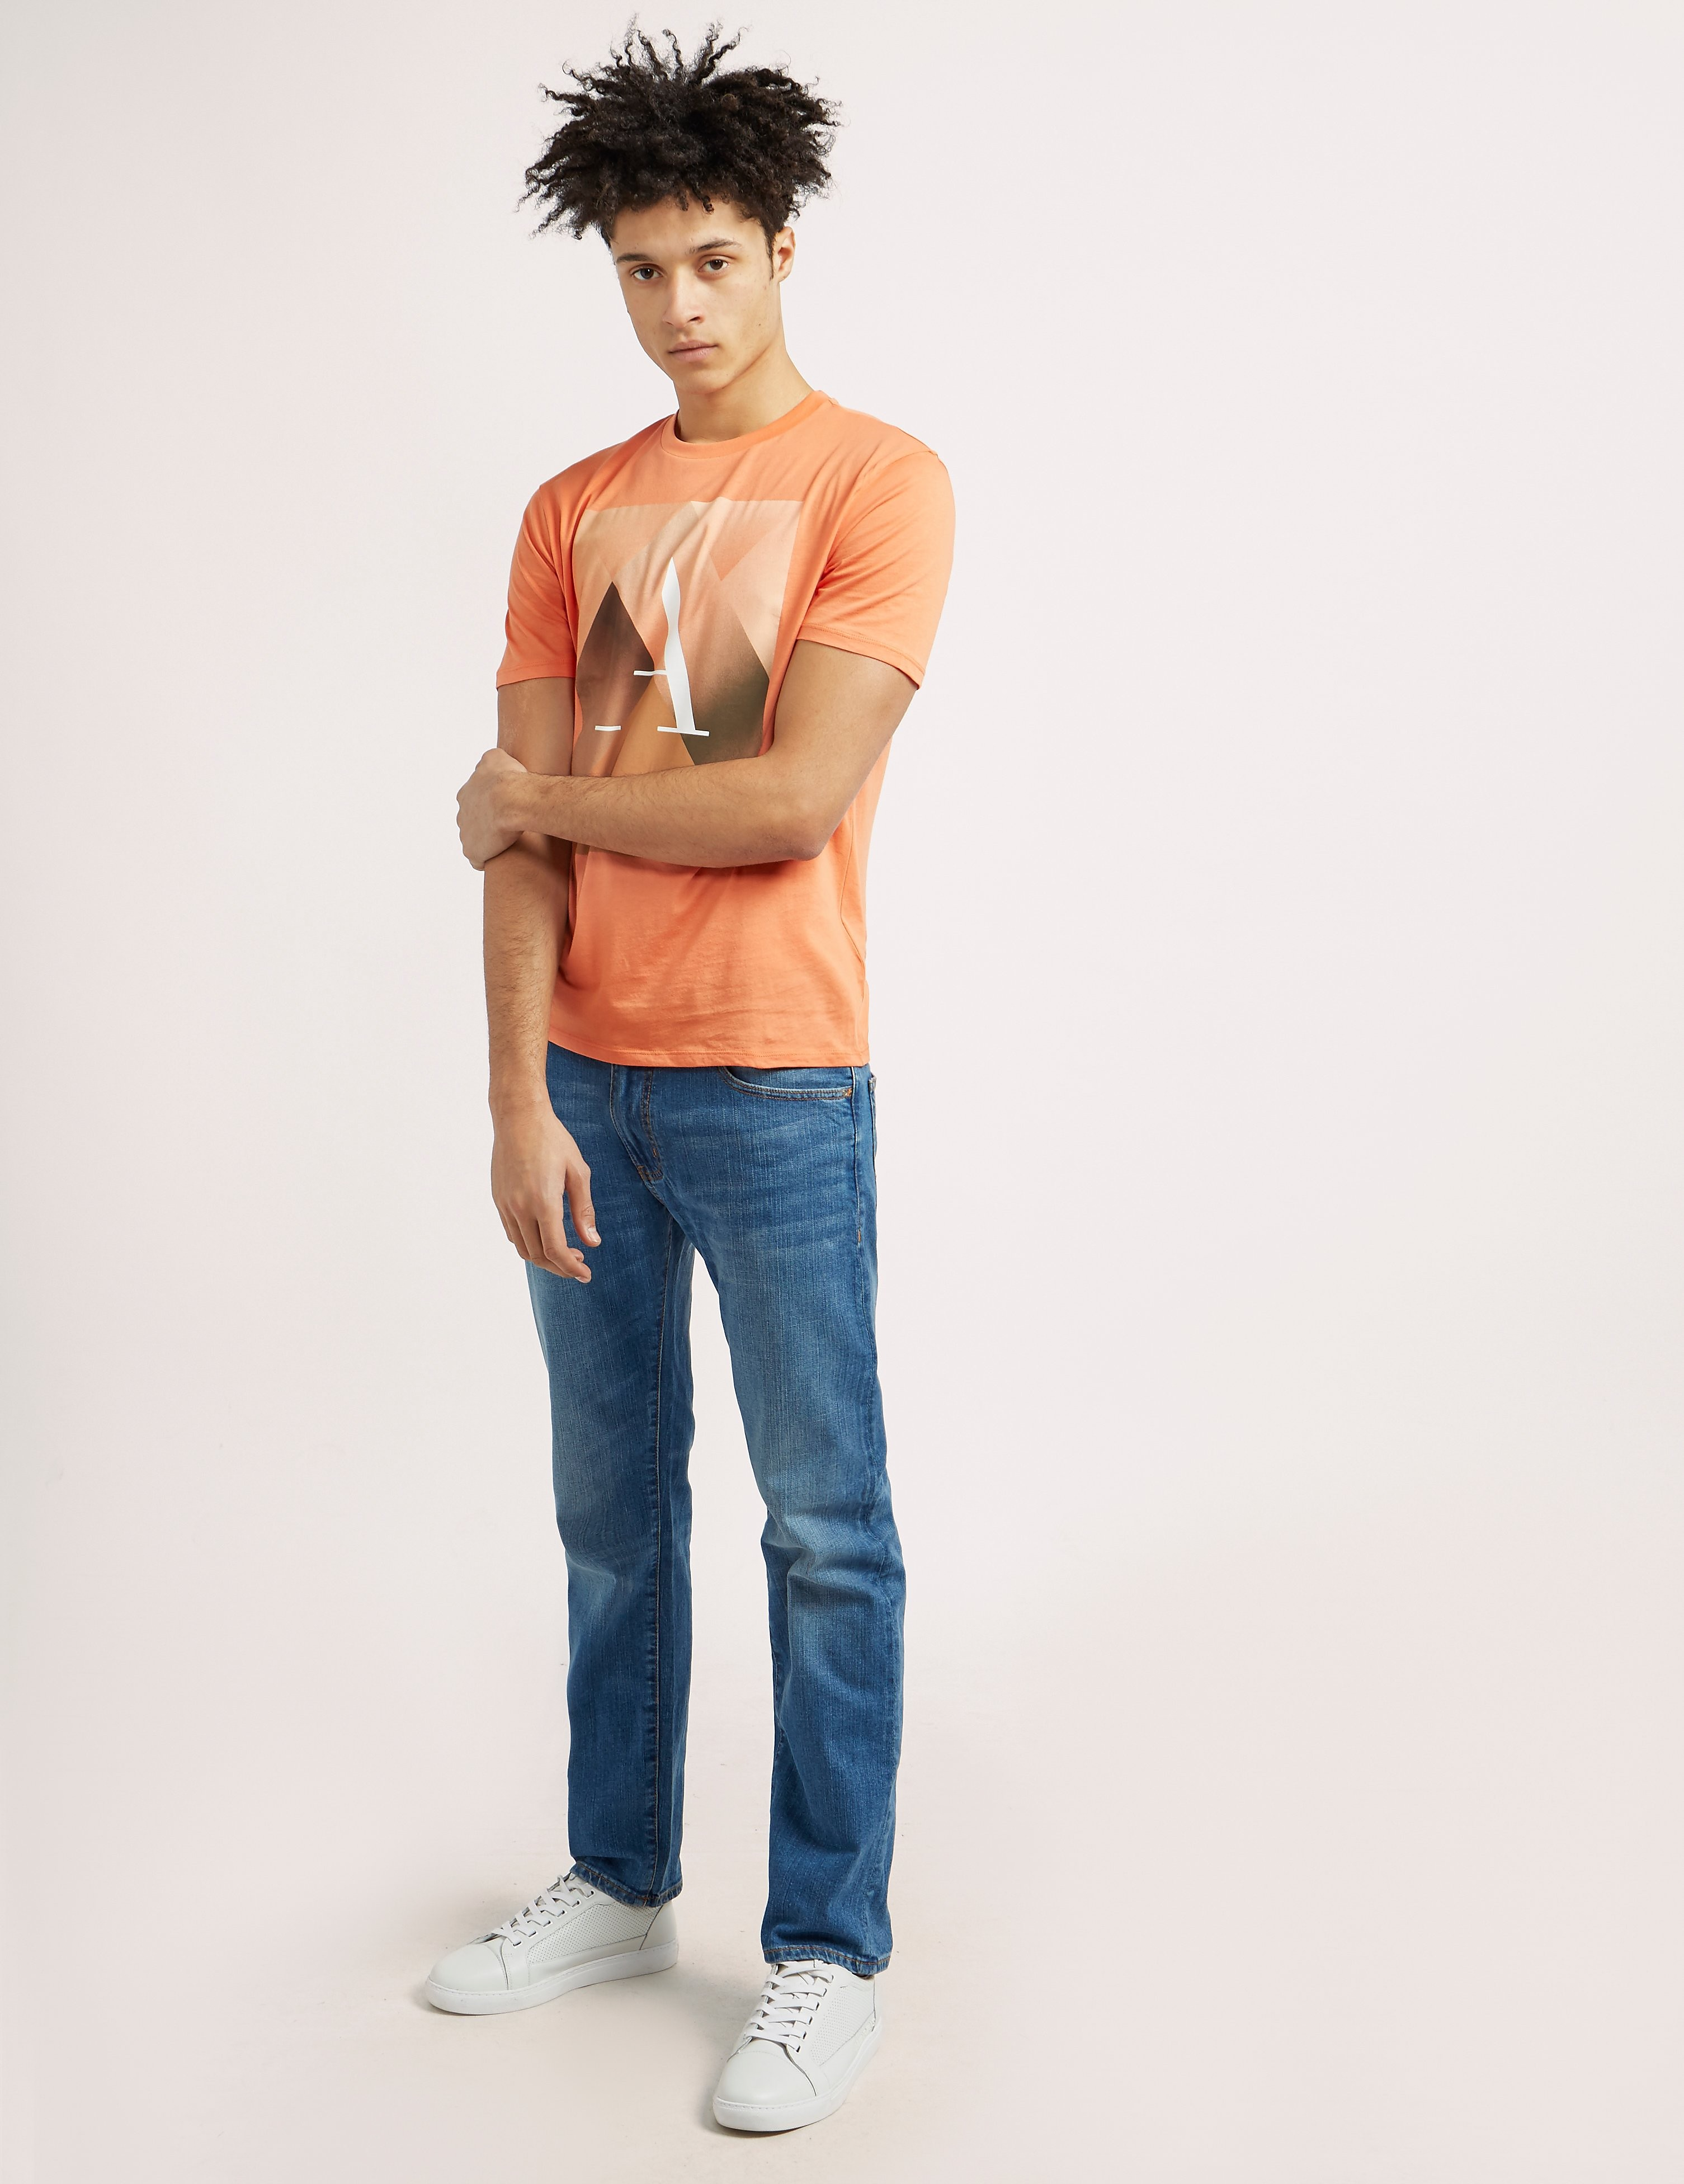 Armani Jeans J45 Jeans - Short